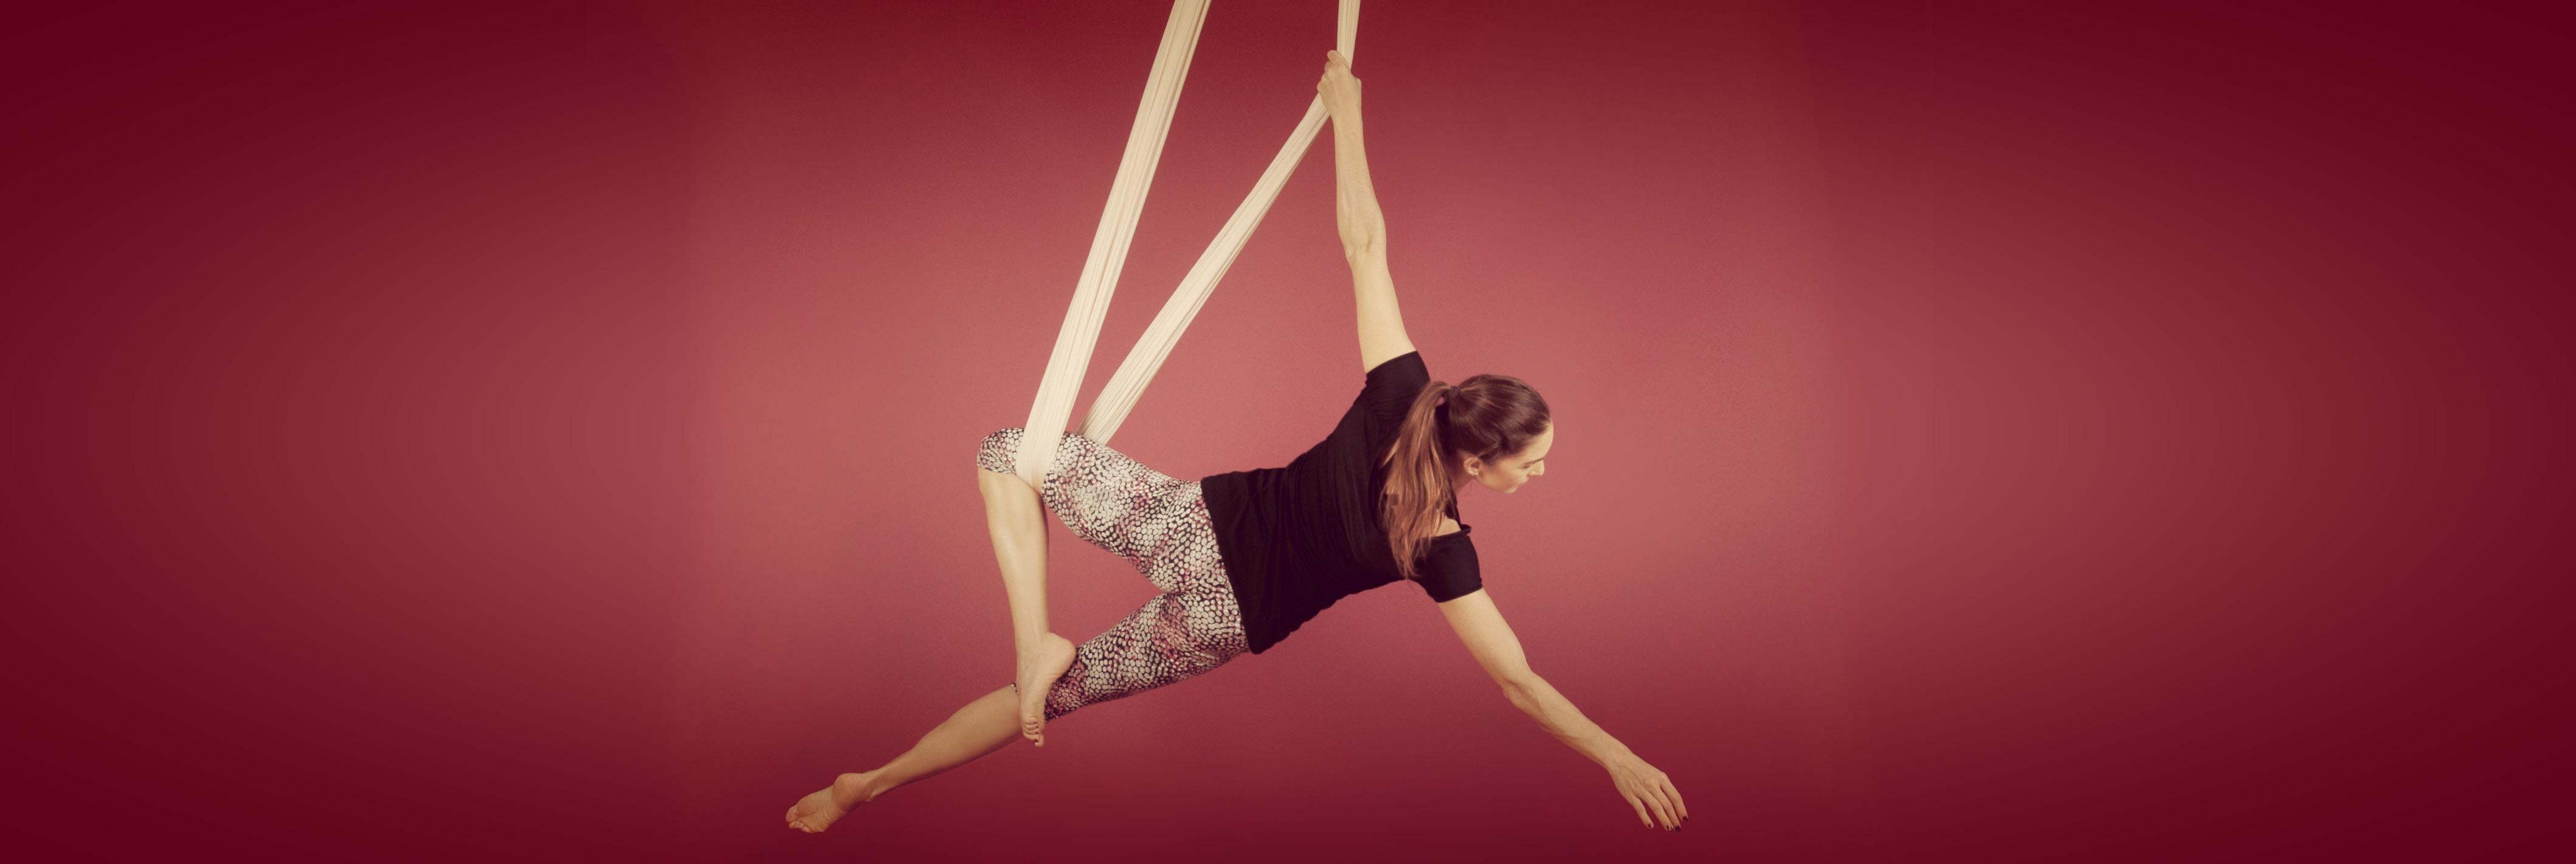 Studio-Elodie-Murnau-Aerial-Yoga-03